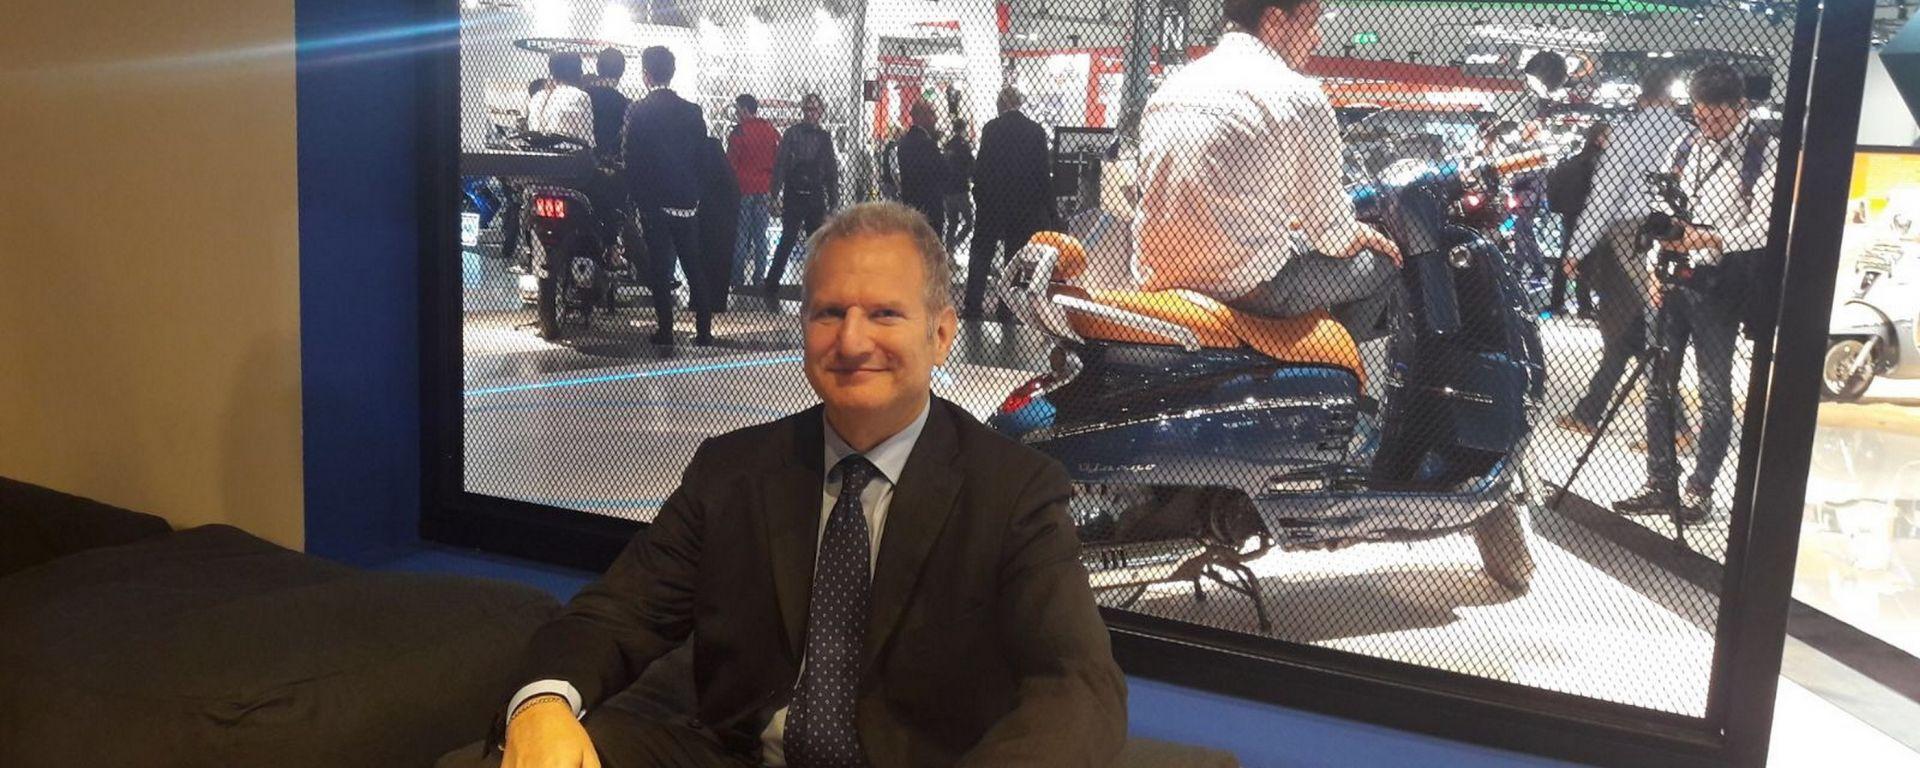 Enrico Pellegrino, Managing Director Peugeot Motorcycles Italia